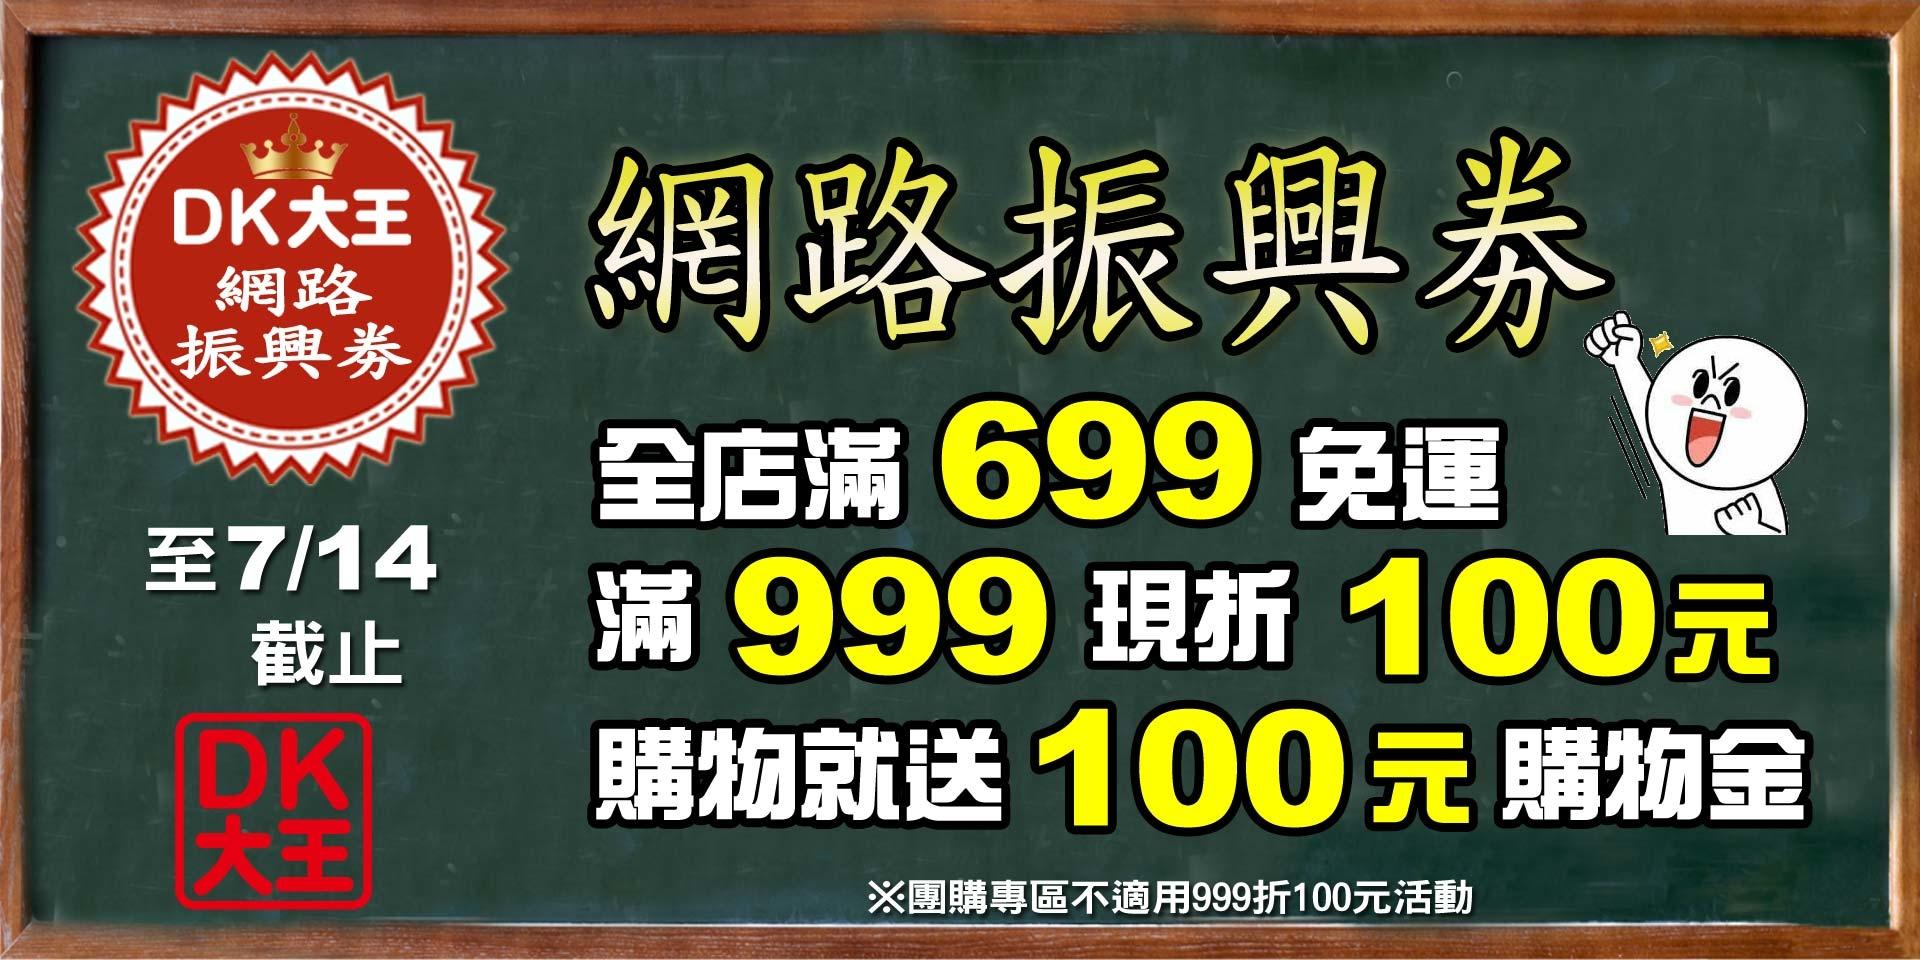 DK網路振興劵~全店滿999現折100元!凡購物就送100元購物金!